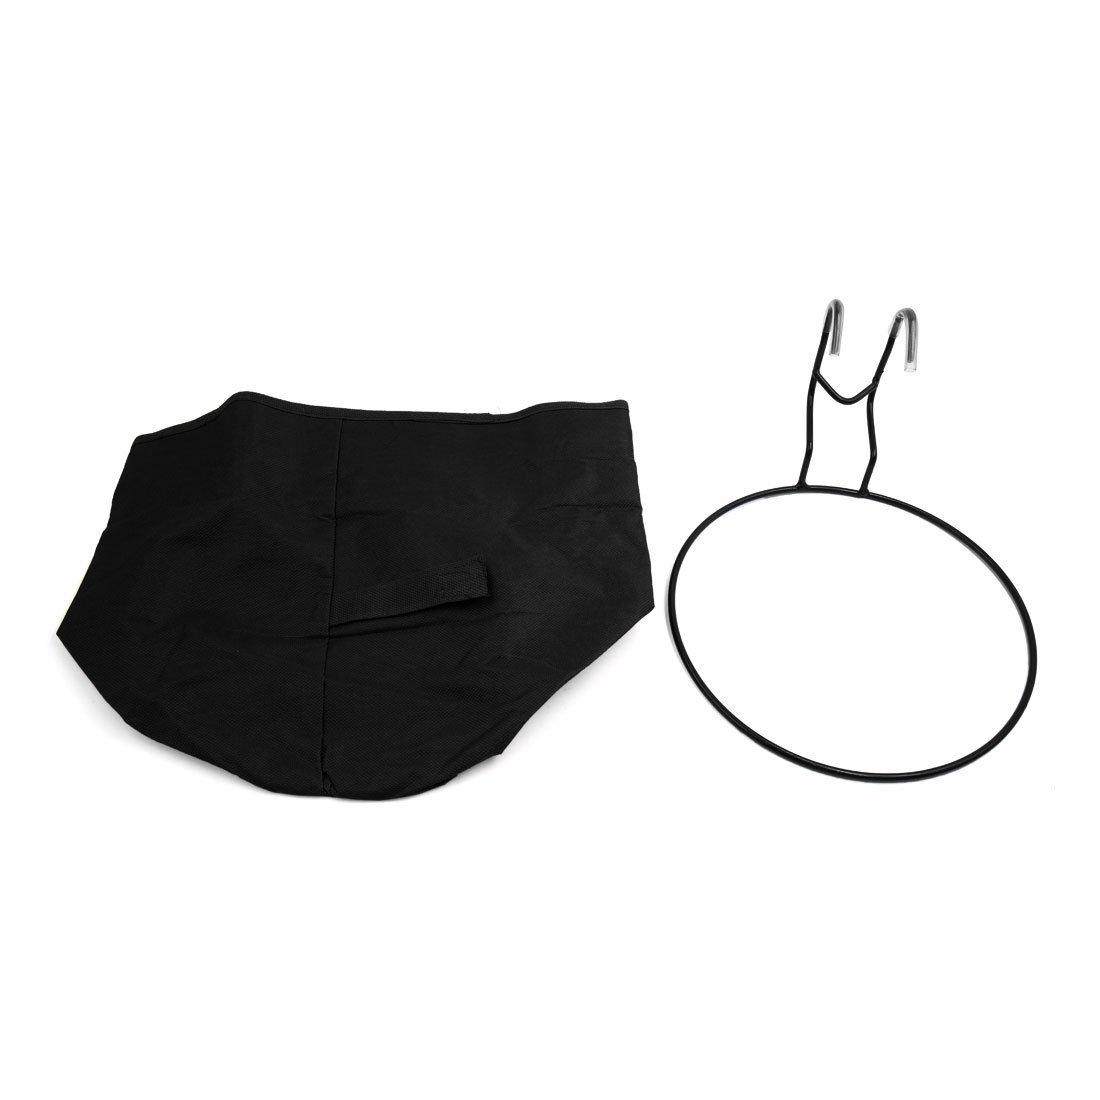 Amazon.com : eDealMax Titular Para Bicicleta plegable Negro frente de la cesta del bolso del manillar de almacenamiento : Sports & Outdoors